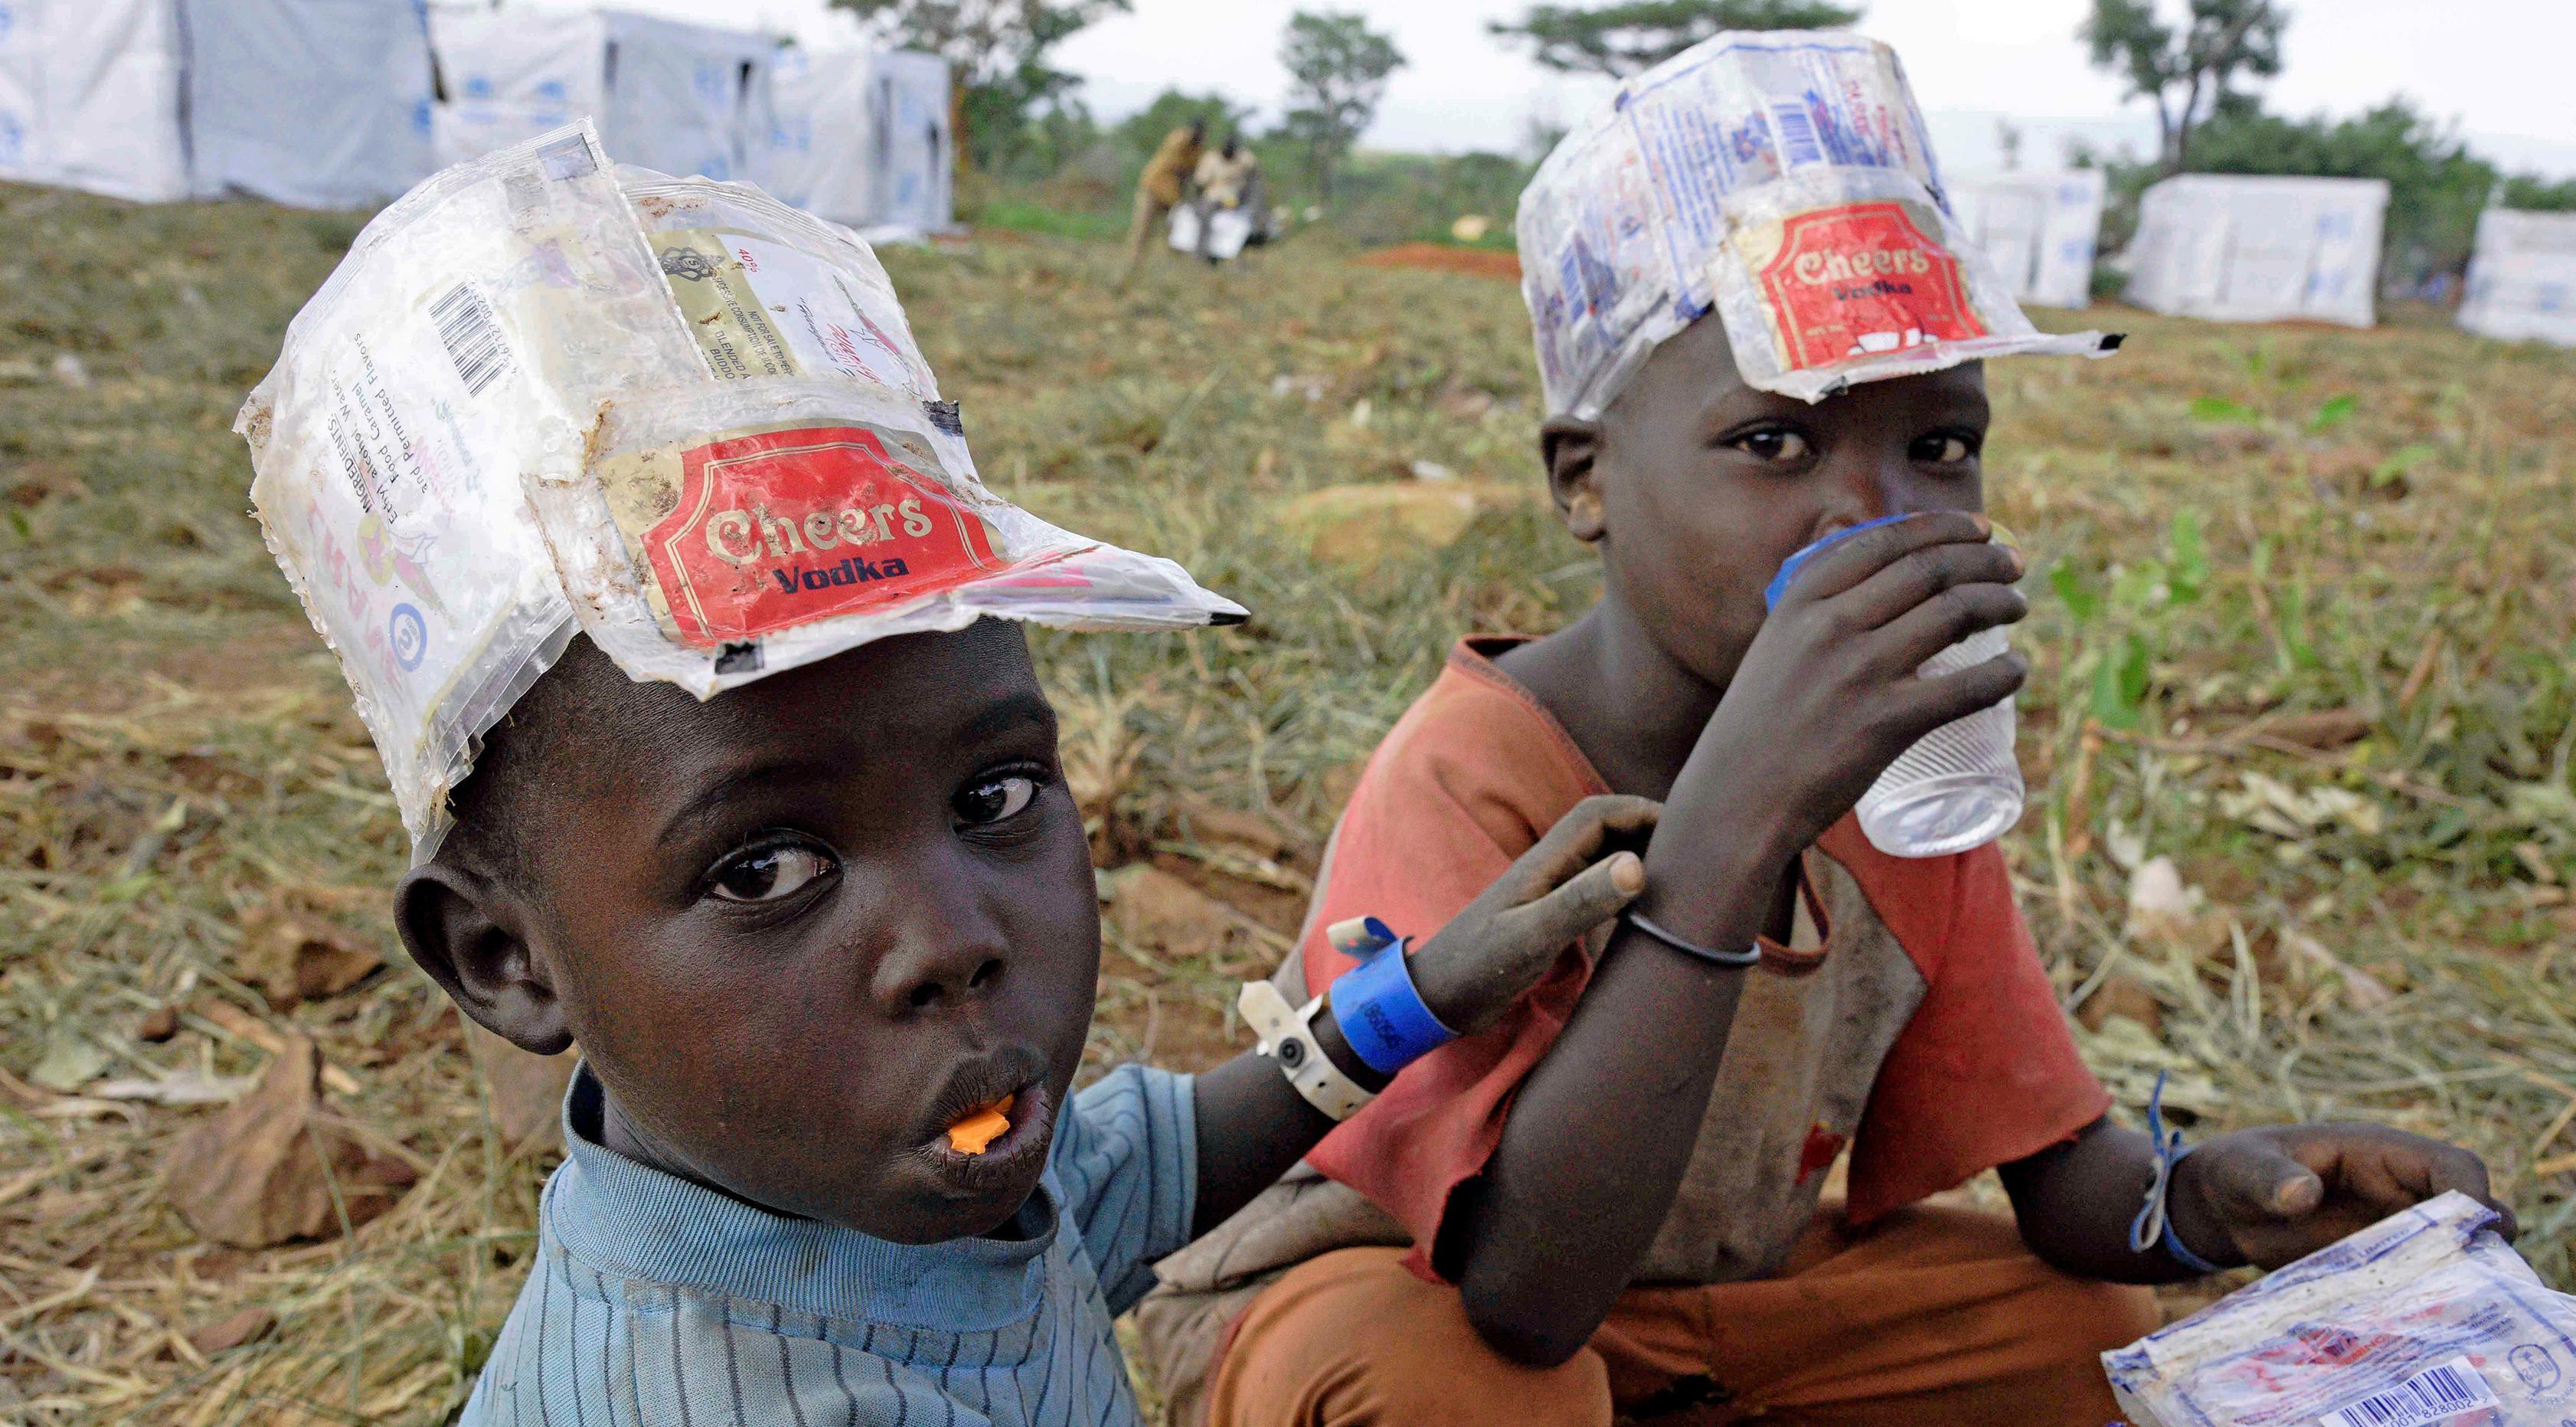 Pengungsi anak-anak baru tiba dari Sudan Selatan di Pos Perbatasan Ngomoromo, Uganda, Senin (10/4). Pertempuran antara pemerintah Sudan Selatan dan pemberontak telah menewaskan sekitar 10 ribu penduduk. (AFP PHOTO / ISAAC KASAMANI)